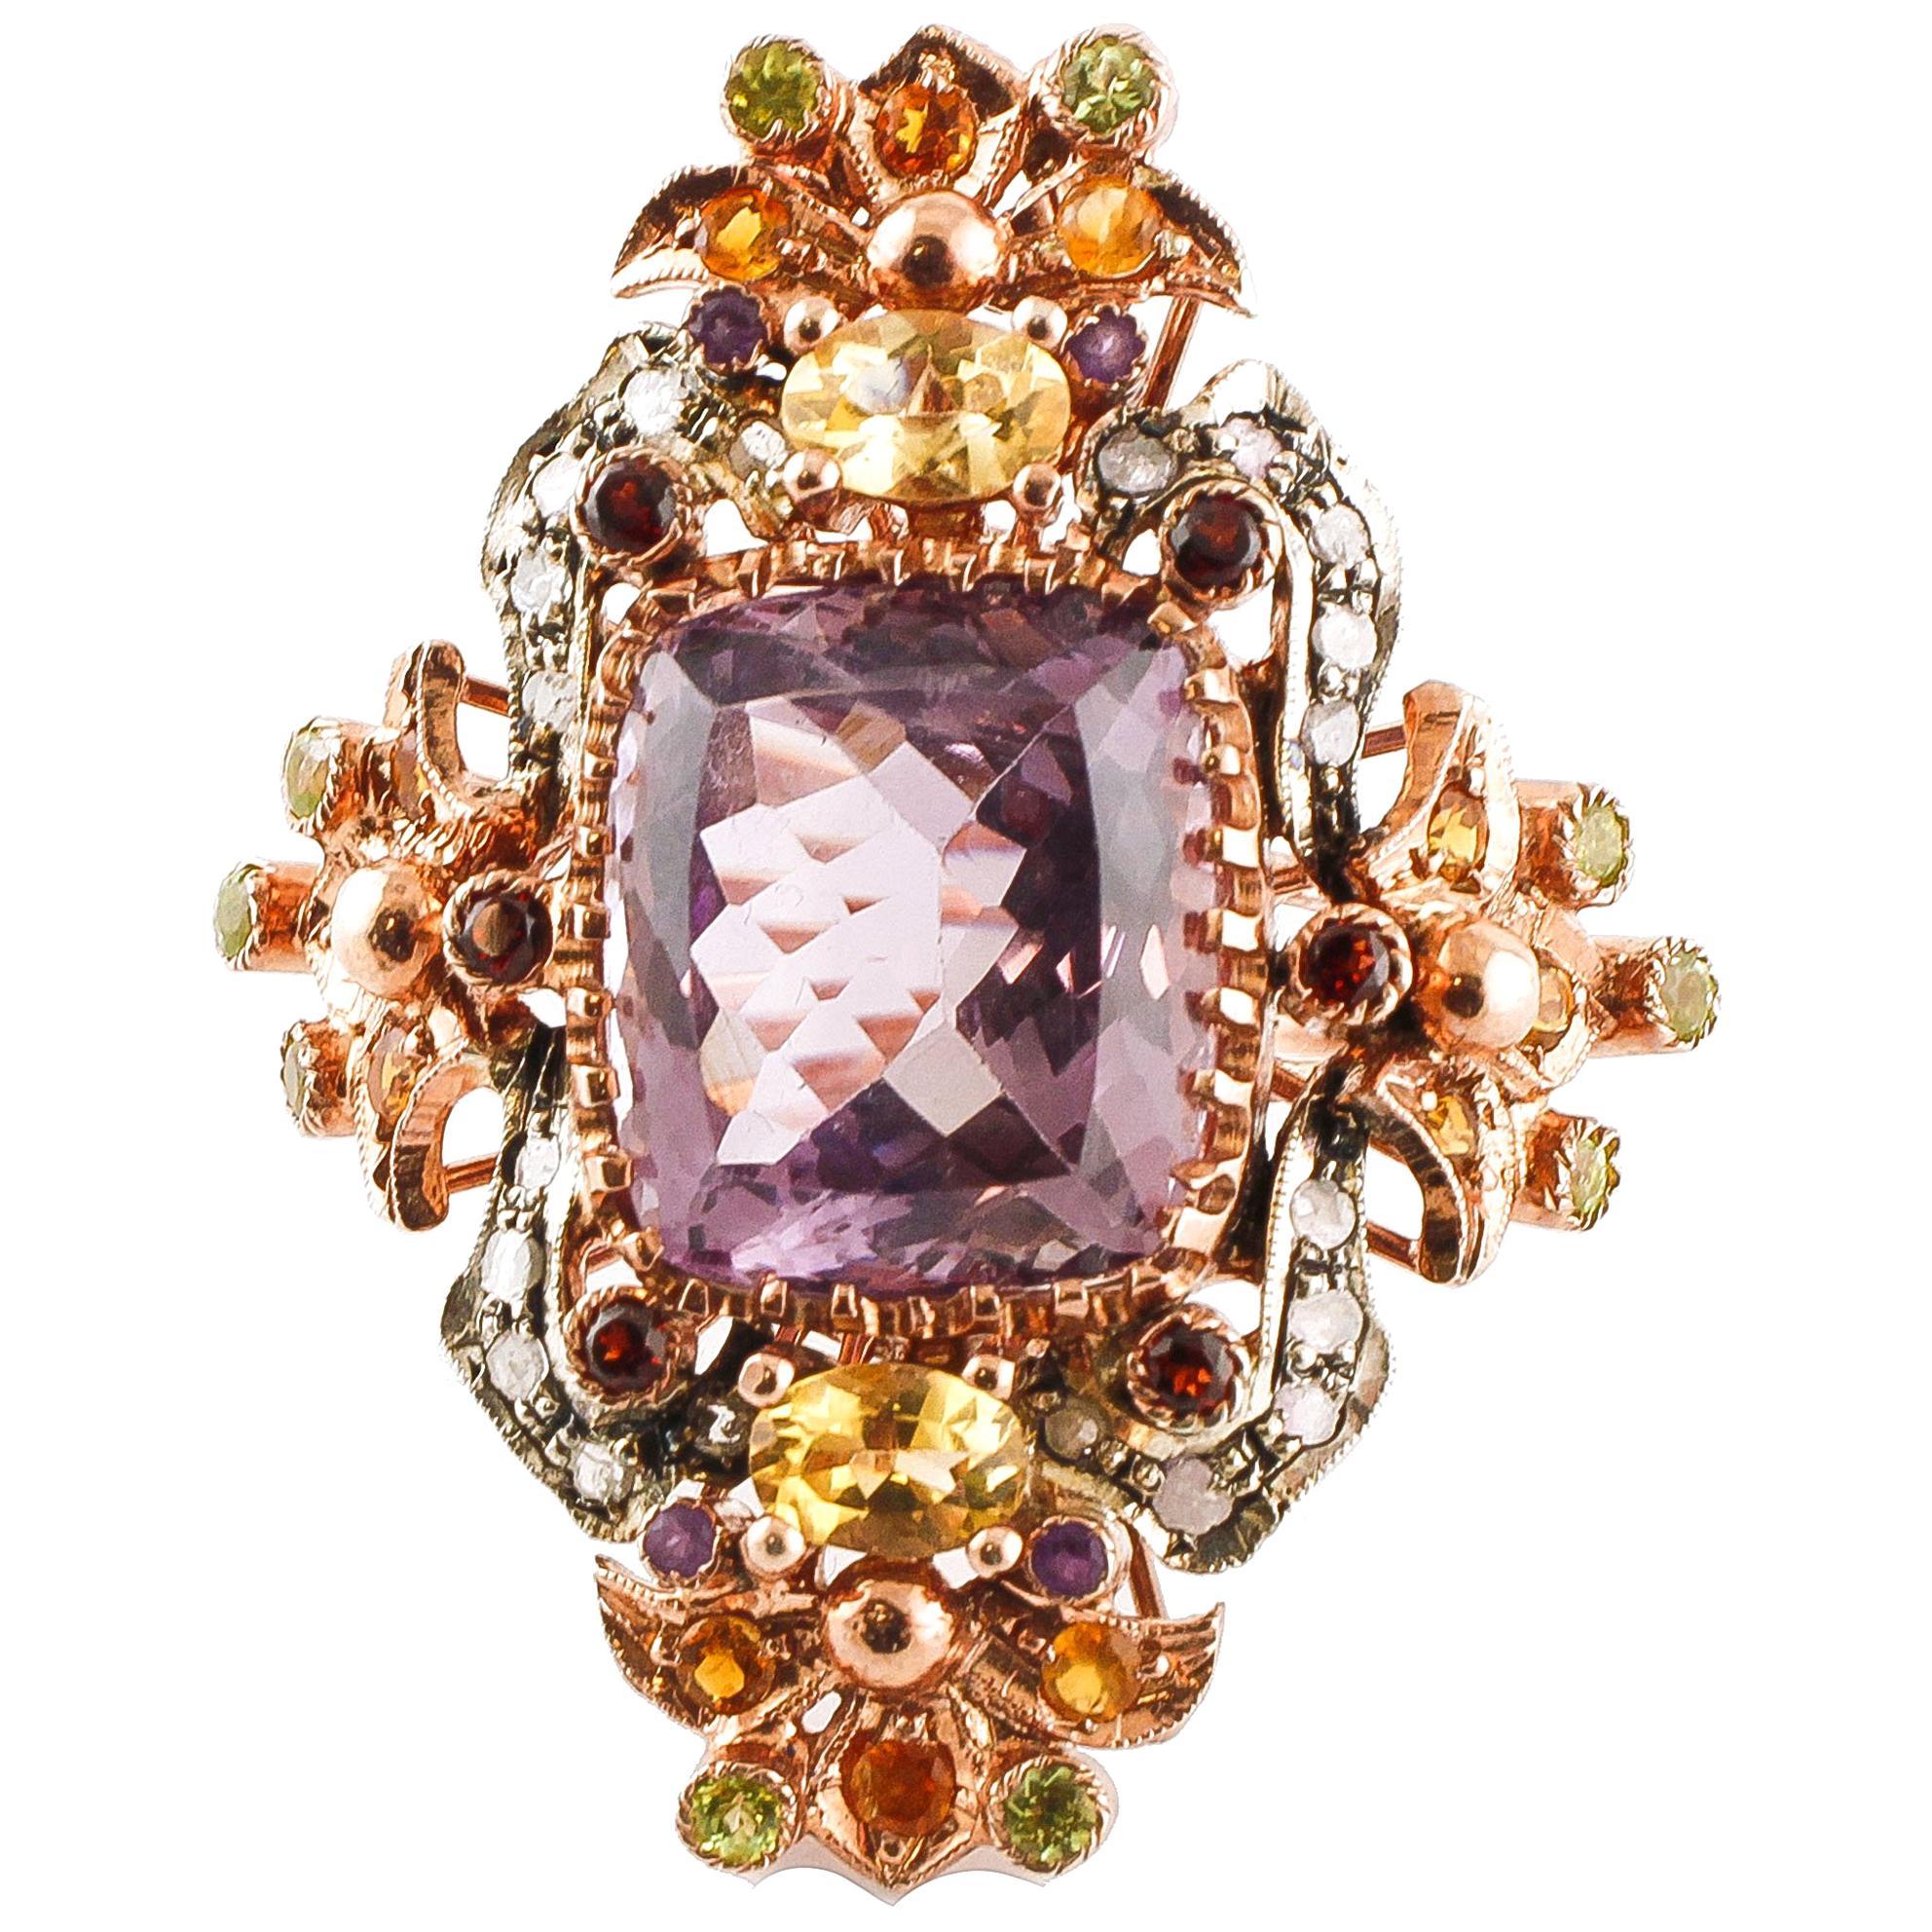 Amethysts, Topazes, Garnets, Peridots, Diamonds, 9 Karat Gold and Silver Ring